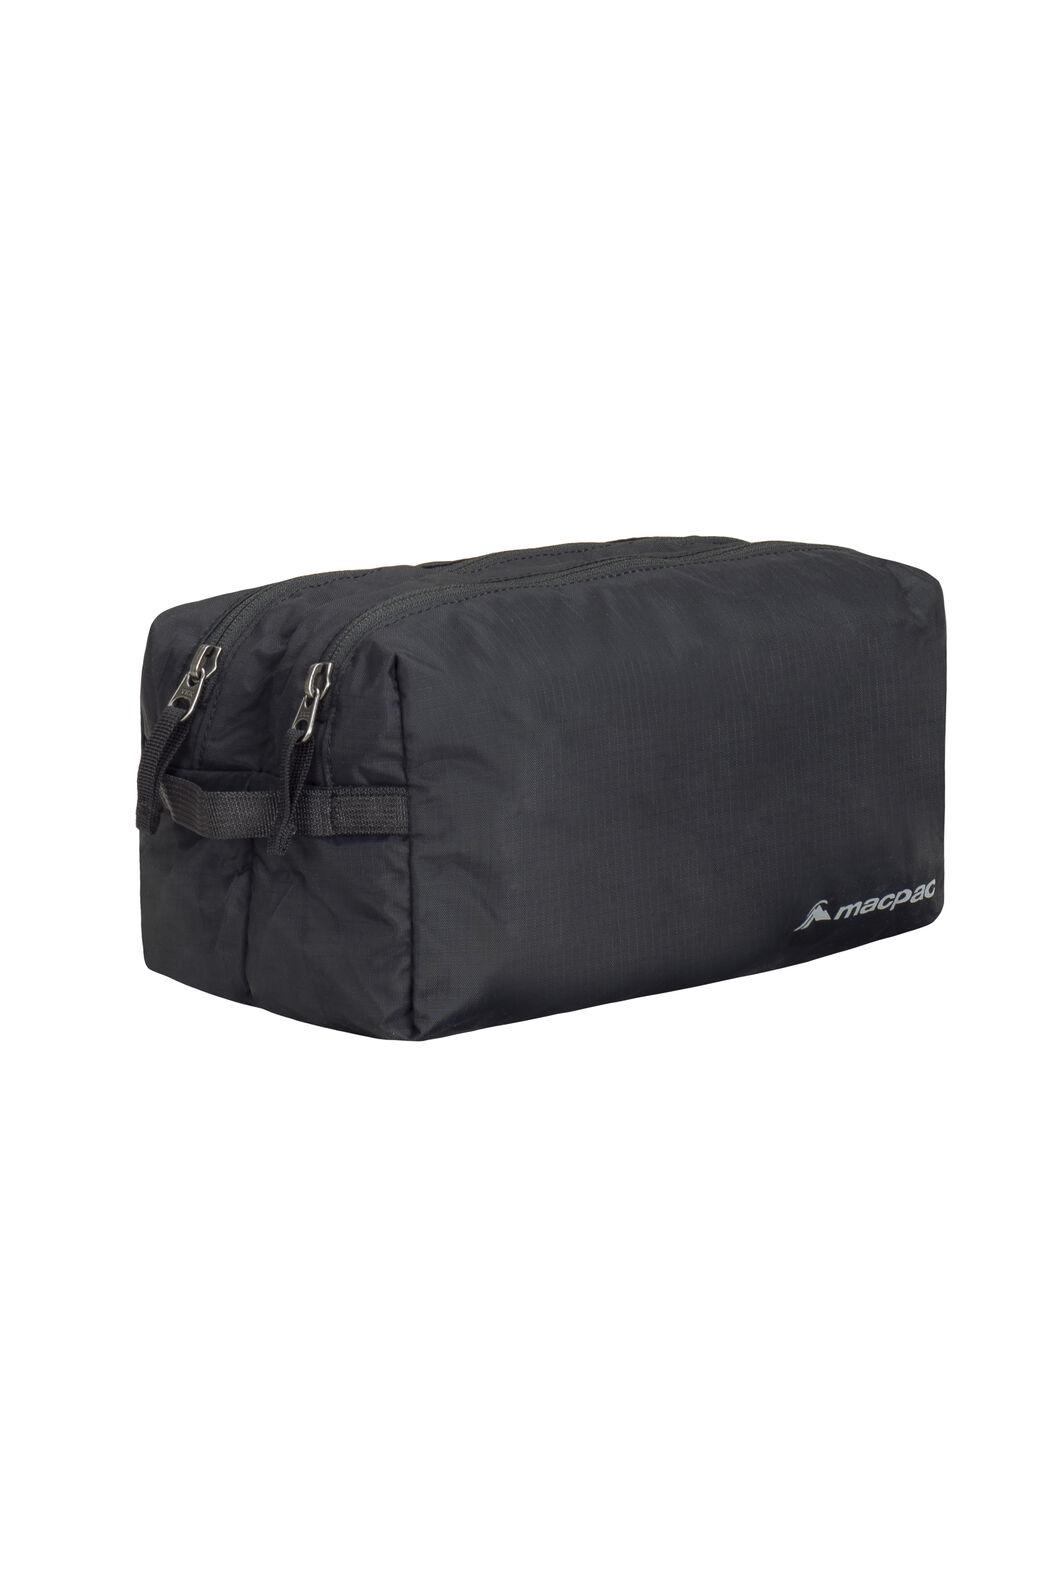 Macpac Double or Nothing Washbag, Black, hi-res